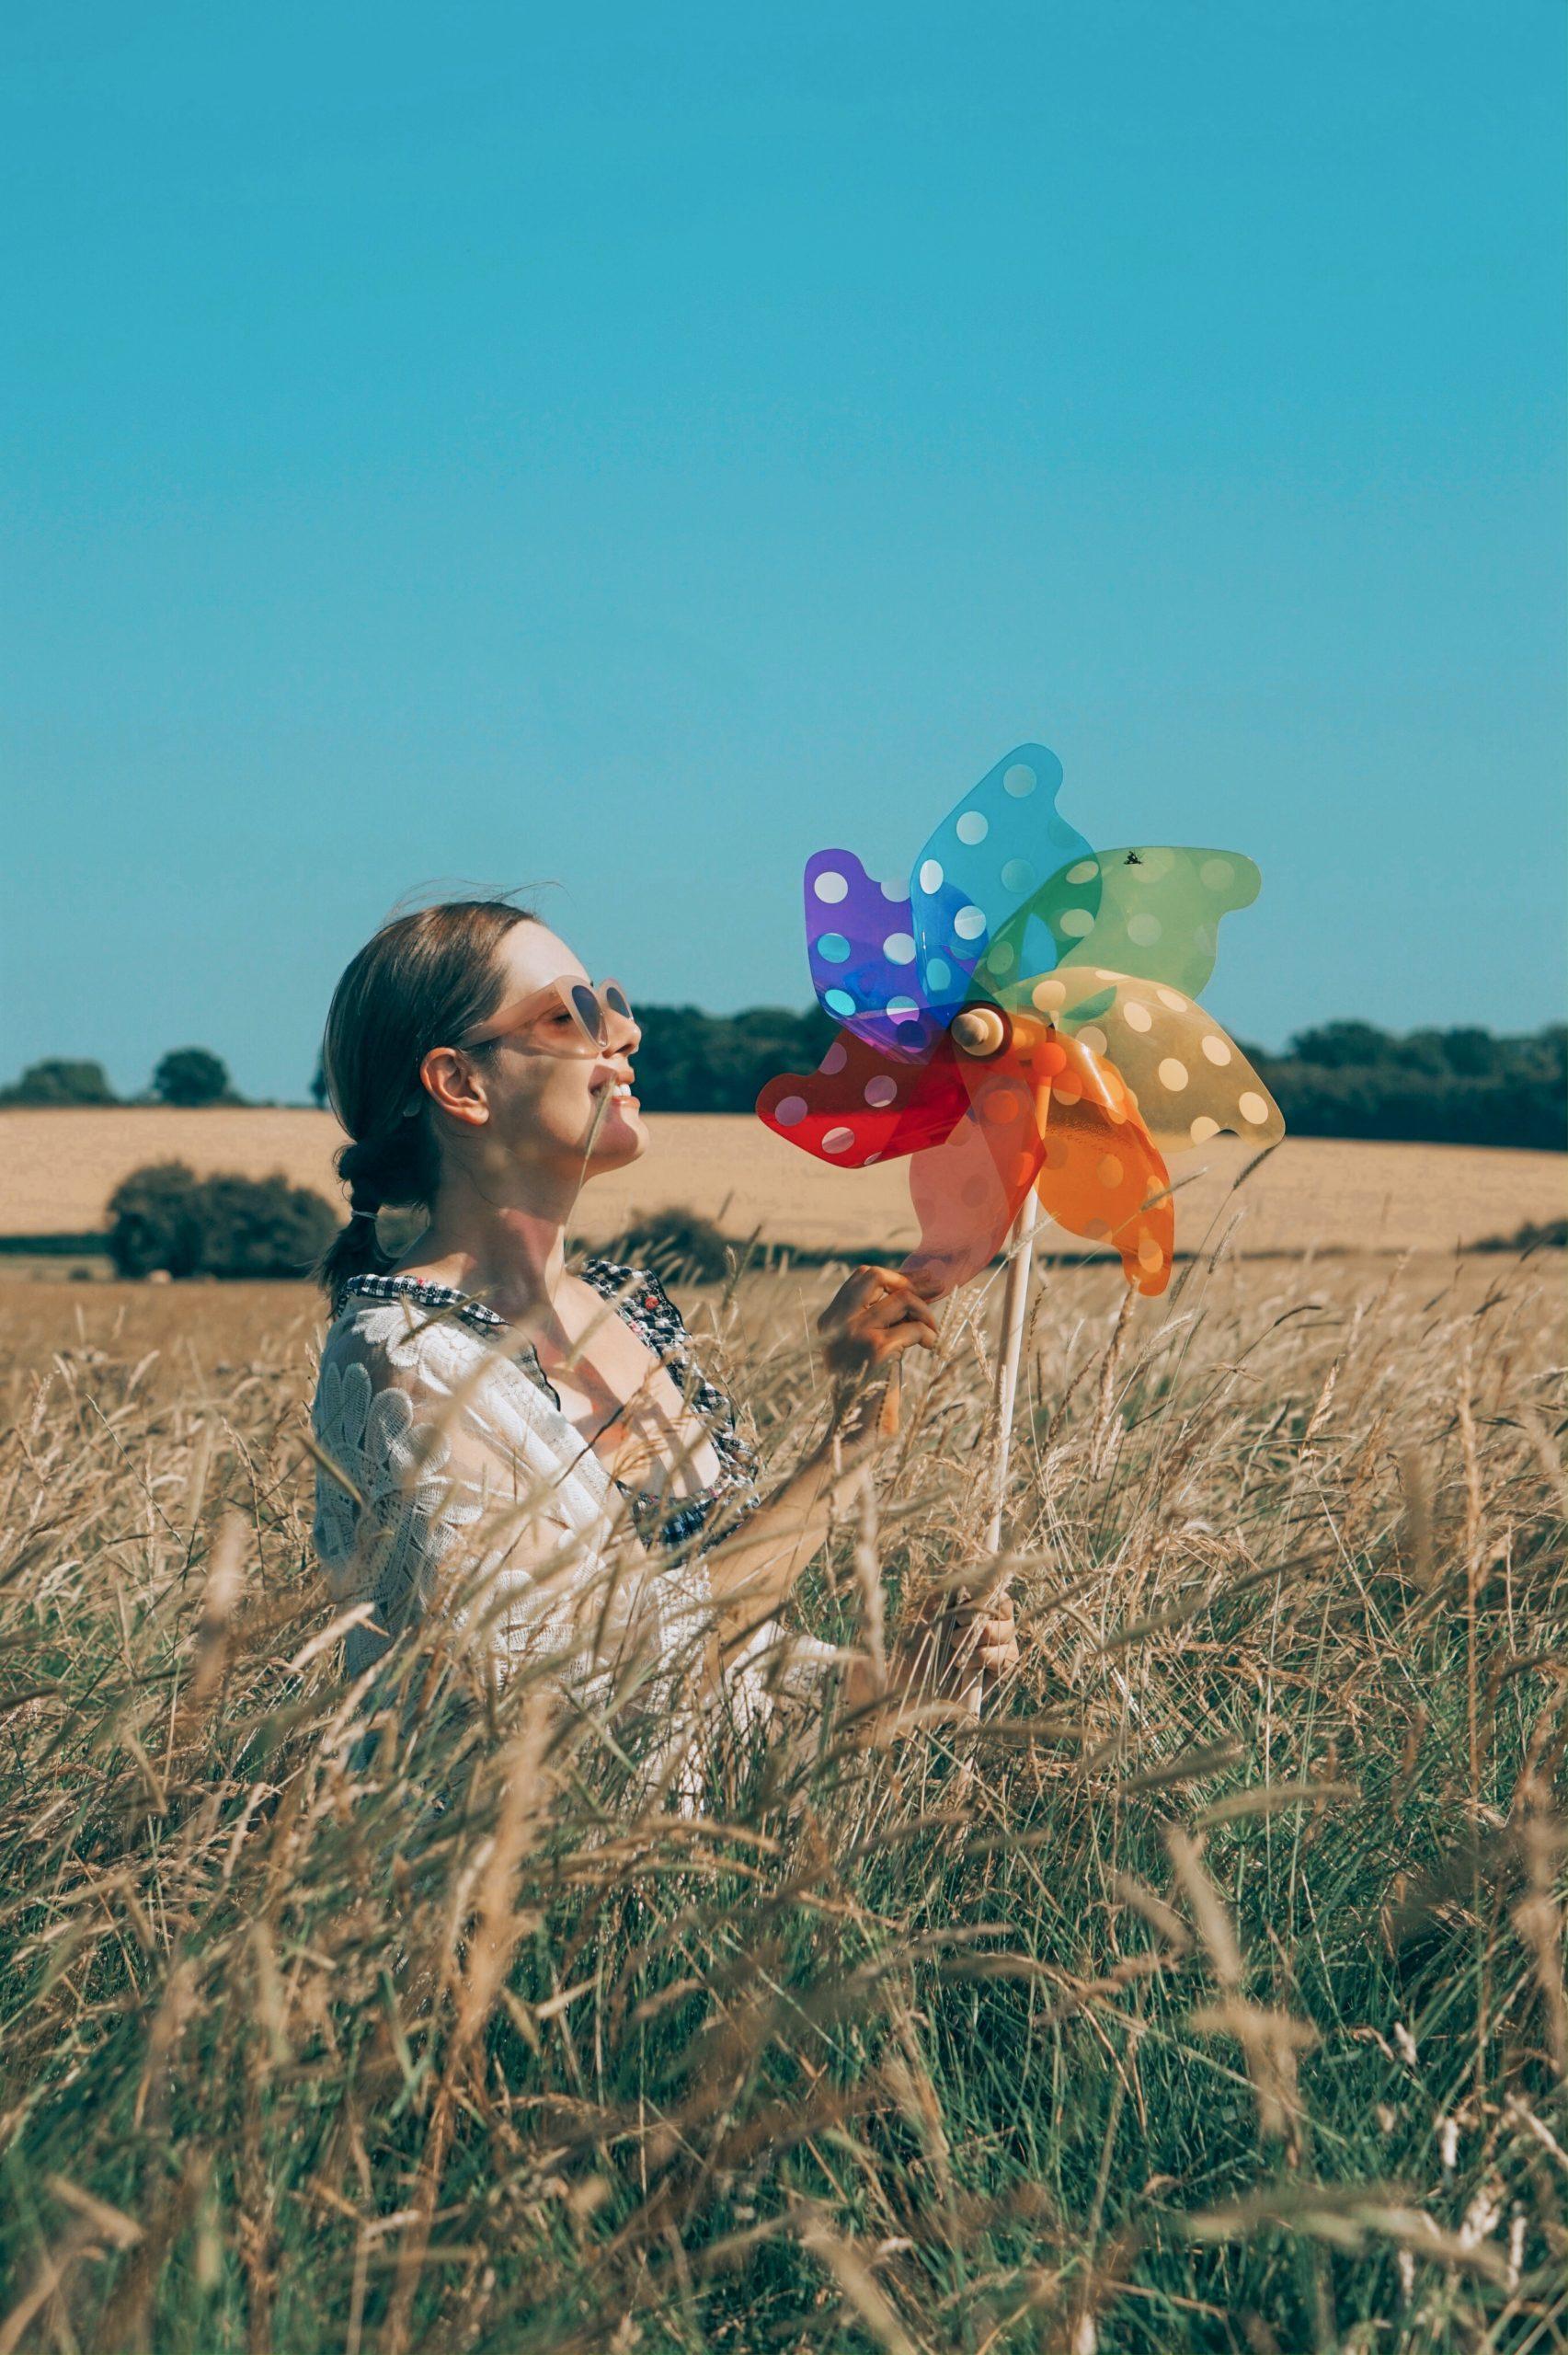 UK STAYCATION IDEAS: English countryside